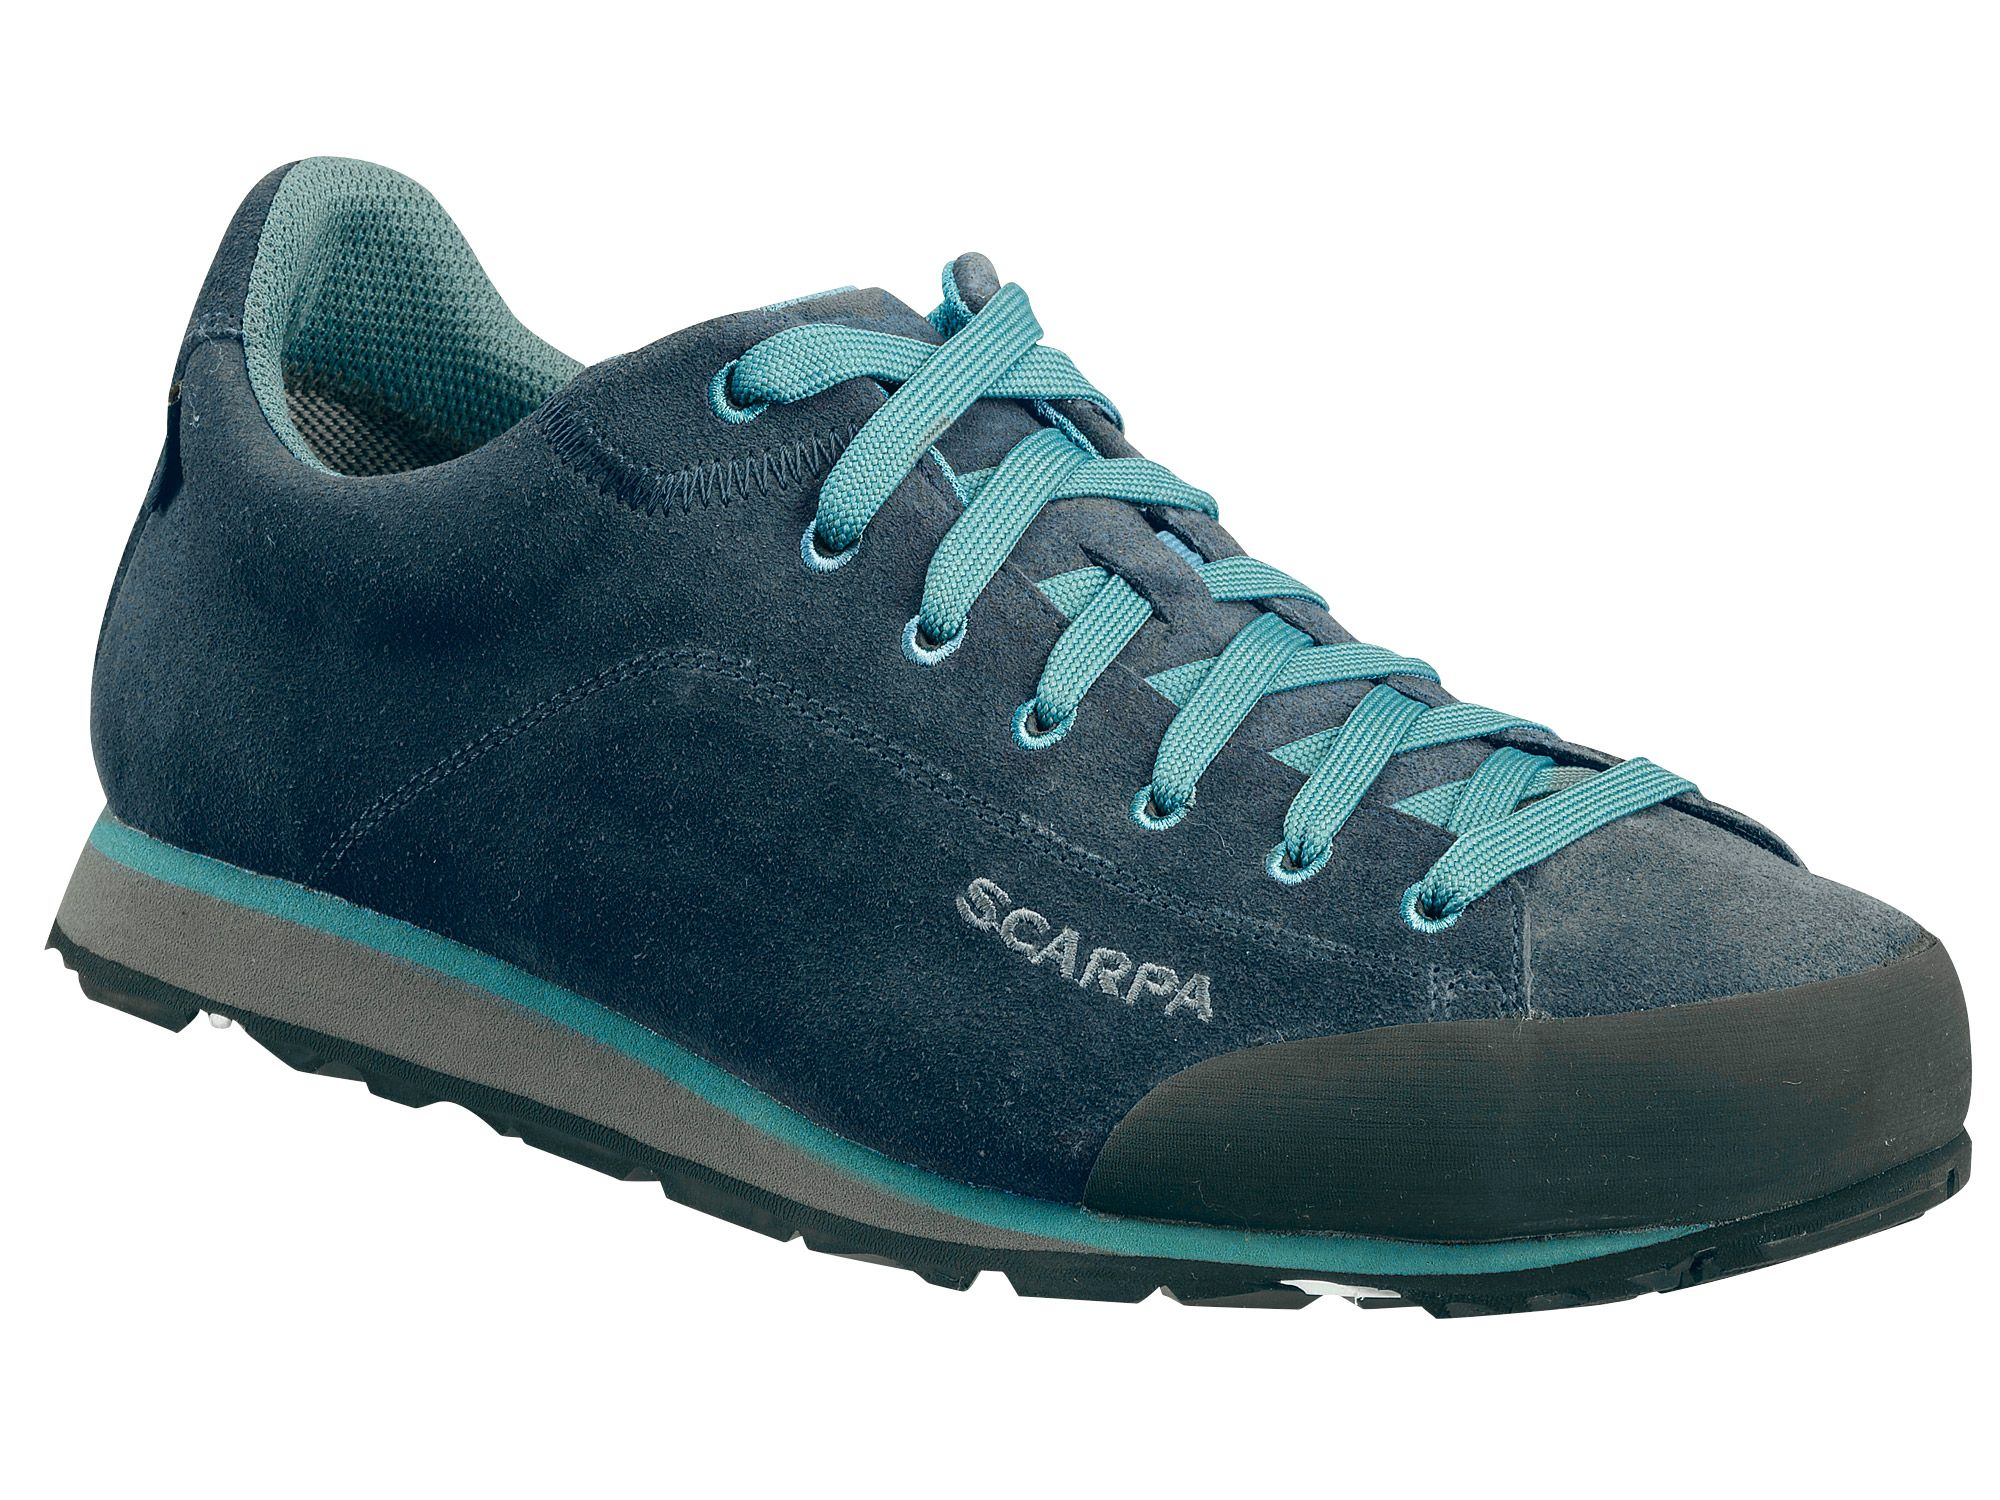 Scarpa Mojito Maxi GTX Ebony/Taupe-30